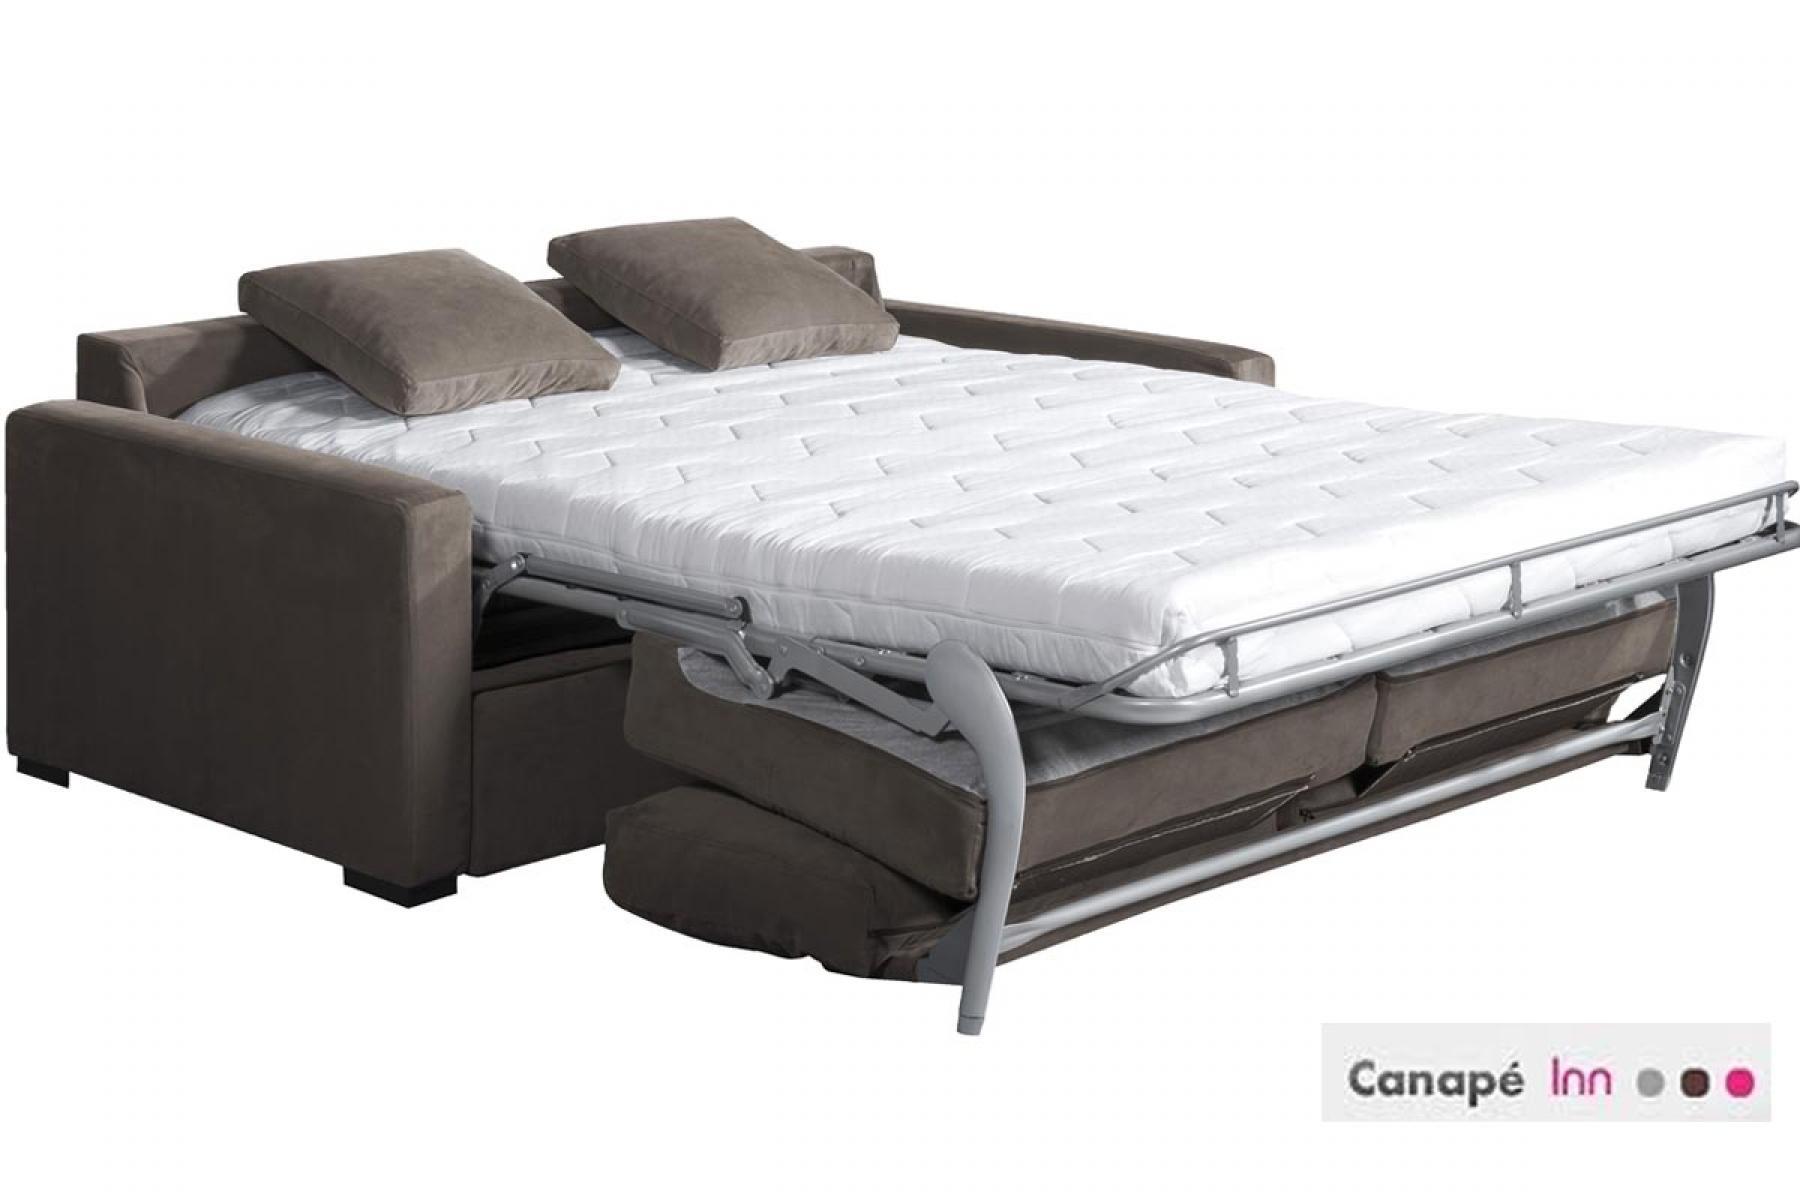 photos canap lit convertible but. Black Bedroom Furniture Sets. Home Design Ideas